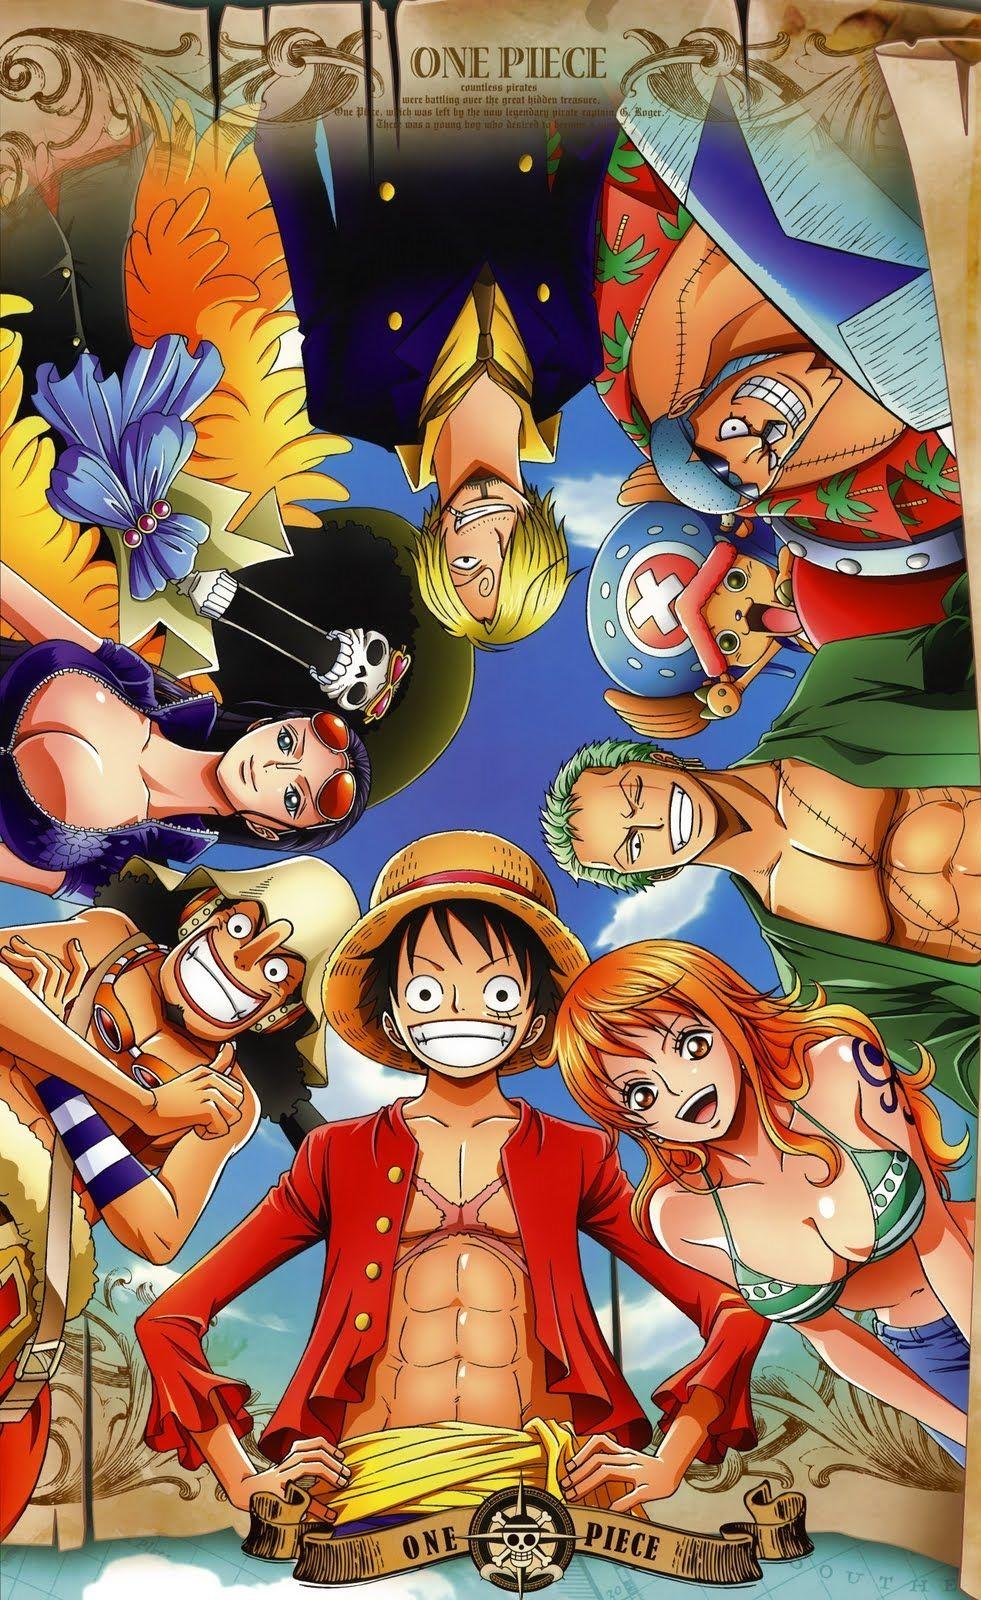 One Piece วันพีช ภาค 1-16 | อะนิเมะ, รูปทีม, ทิม เบอร์ตัน